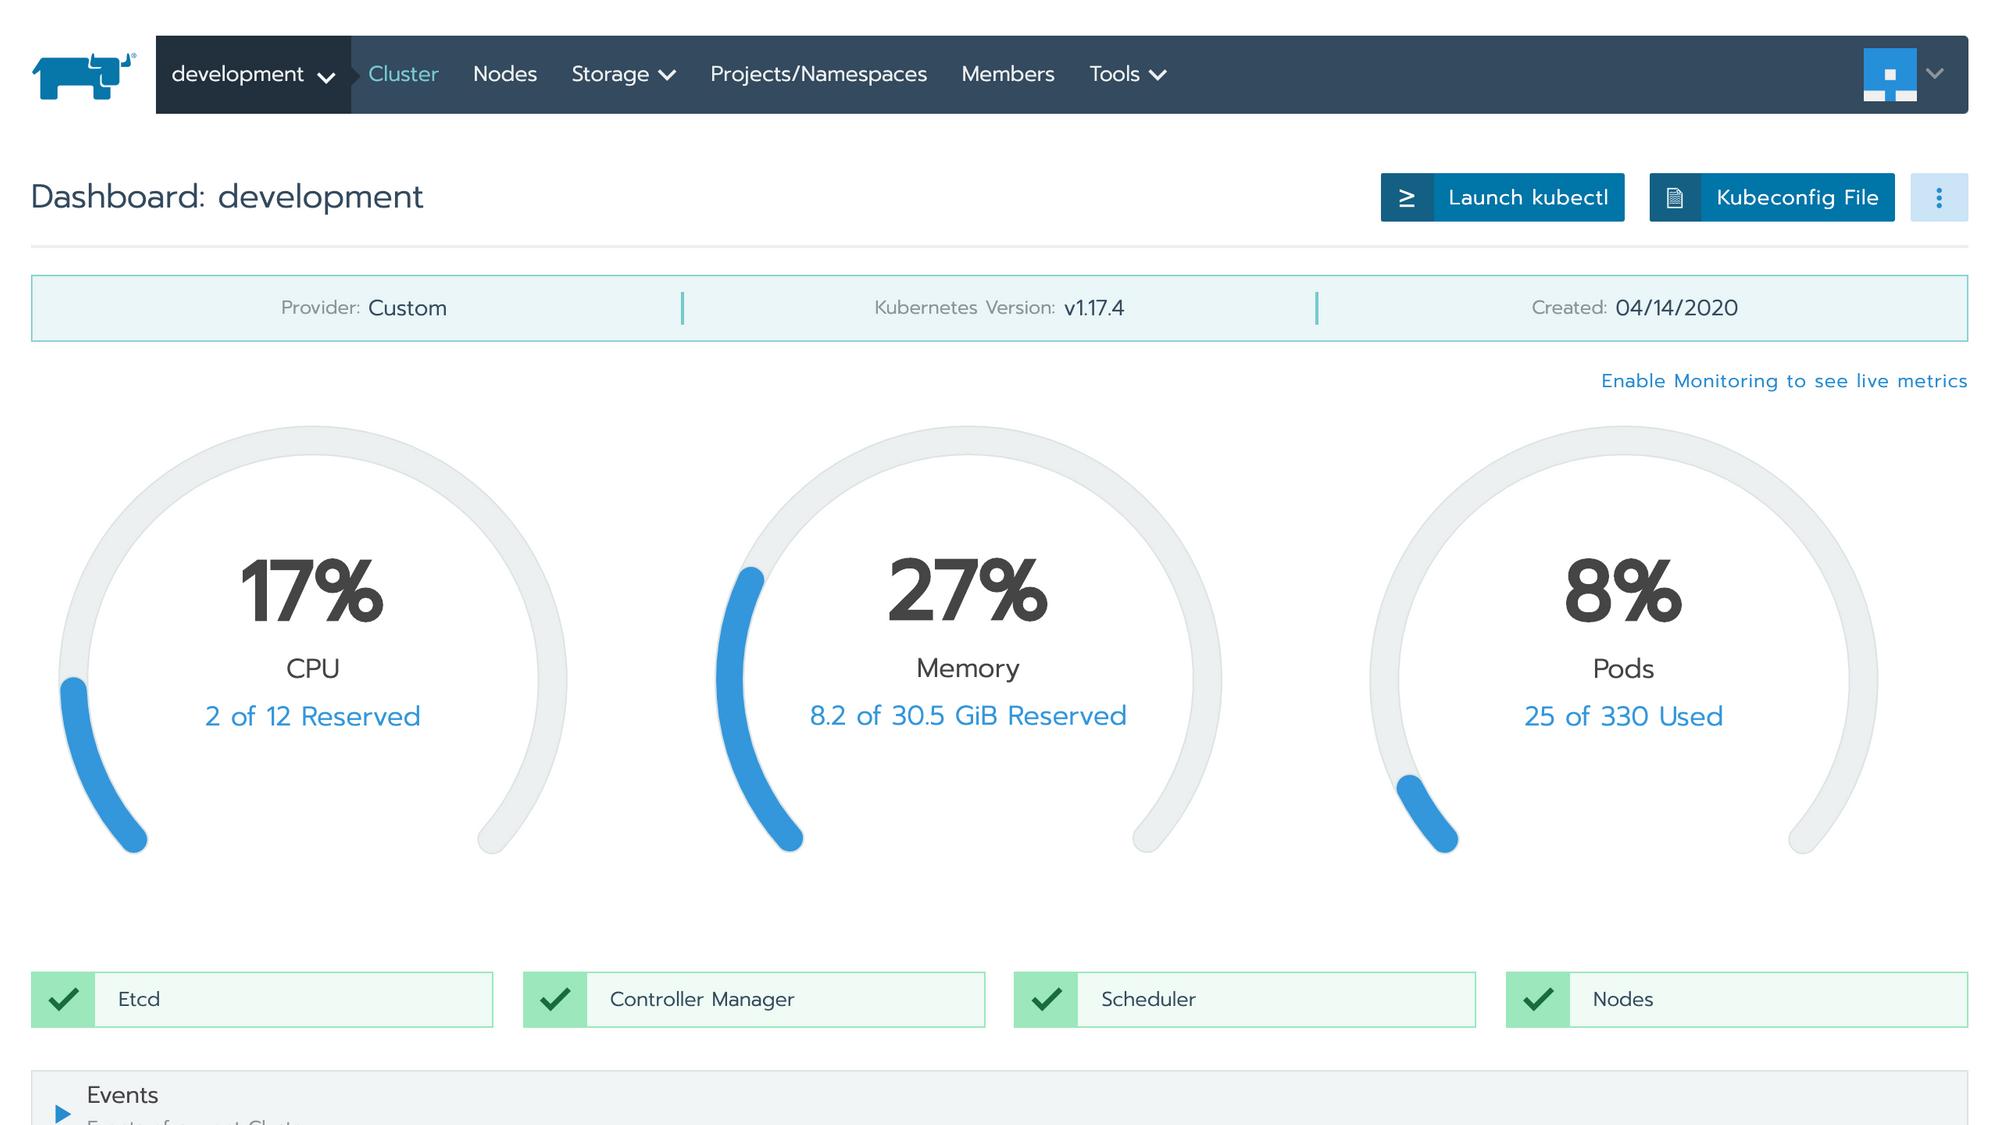 Kubernetes + GitLab 微服务应用自动化部署